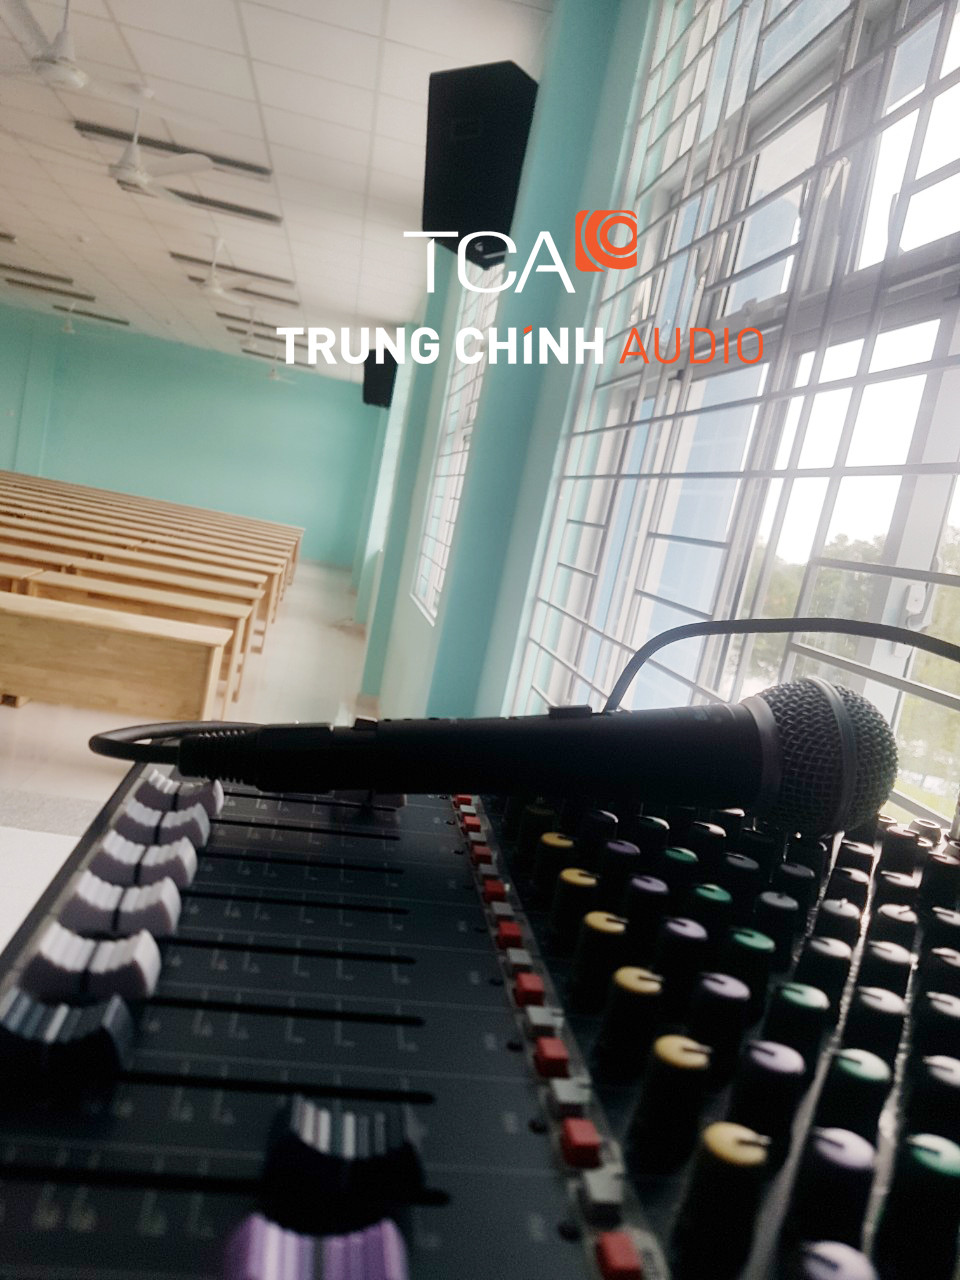 tca-lap-dat-am-thanh-truong-tieu-hoc-binh-chanh-019